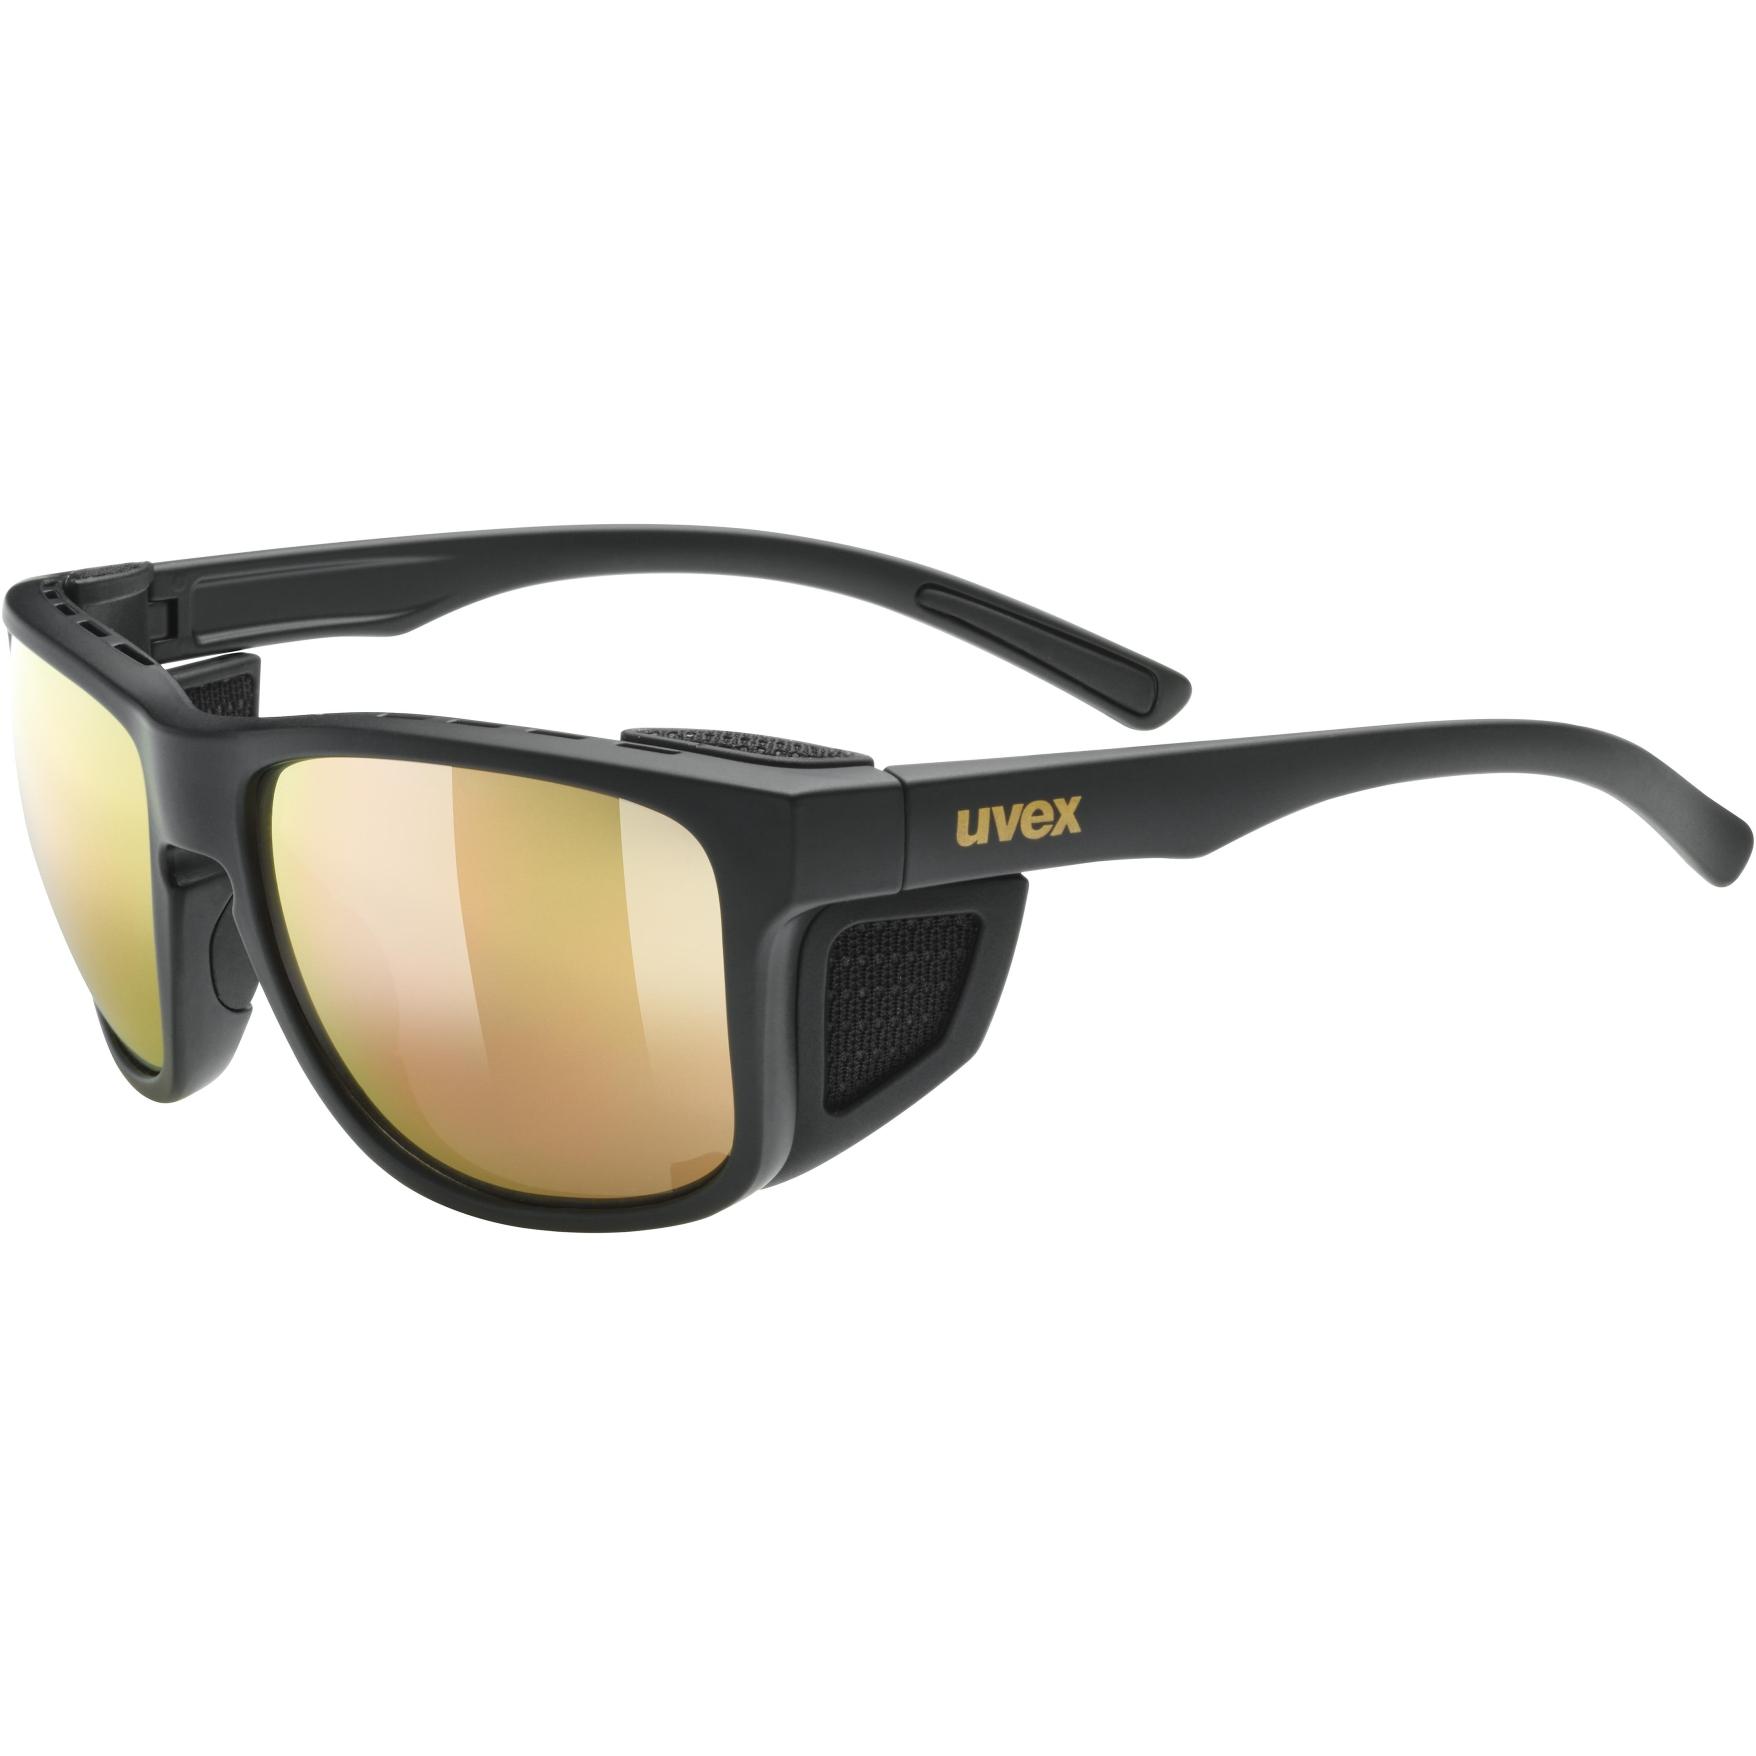 Uvex sportstyle 312 Glasses - black mat gold/mirror gold